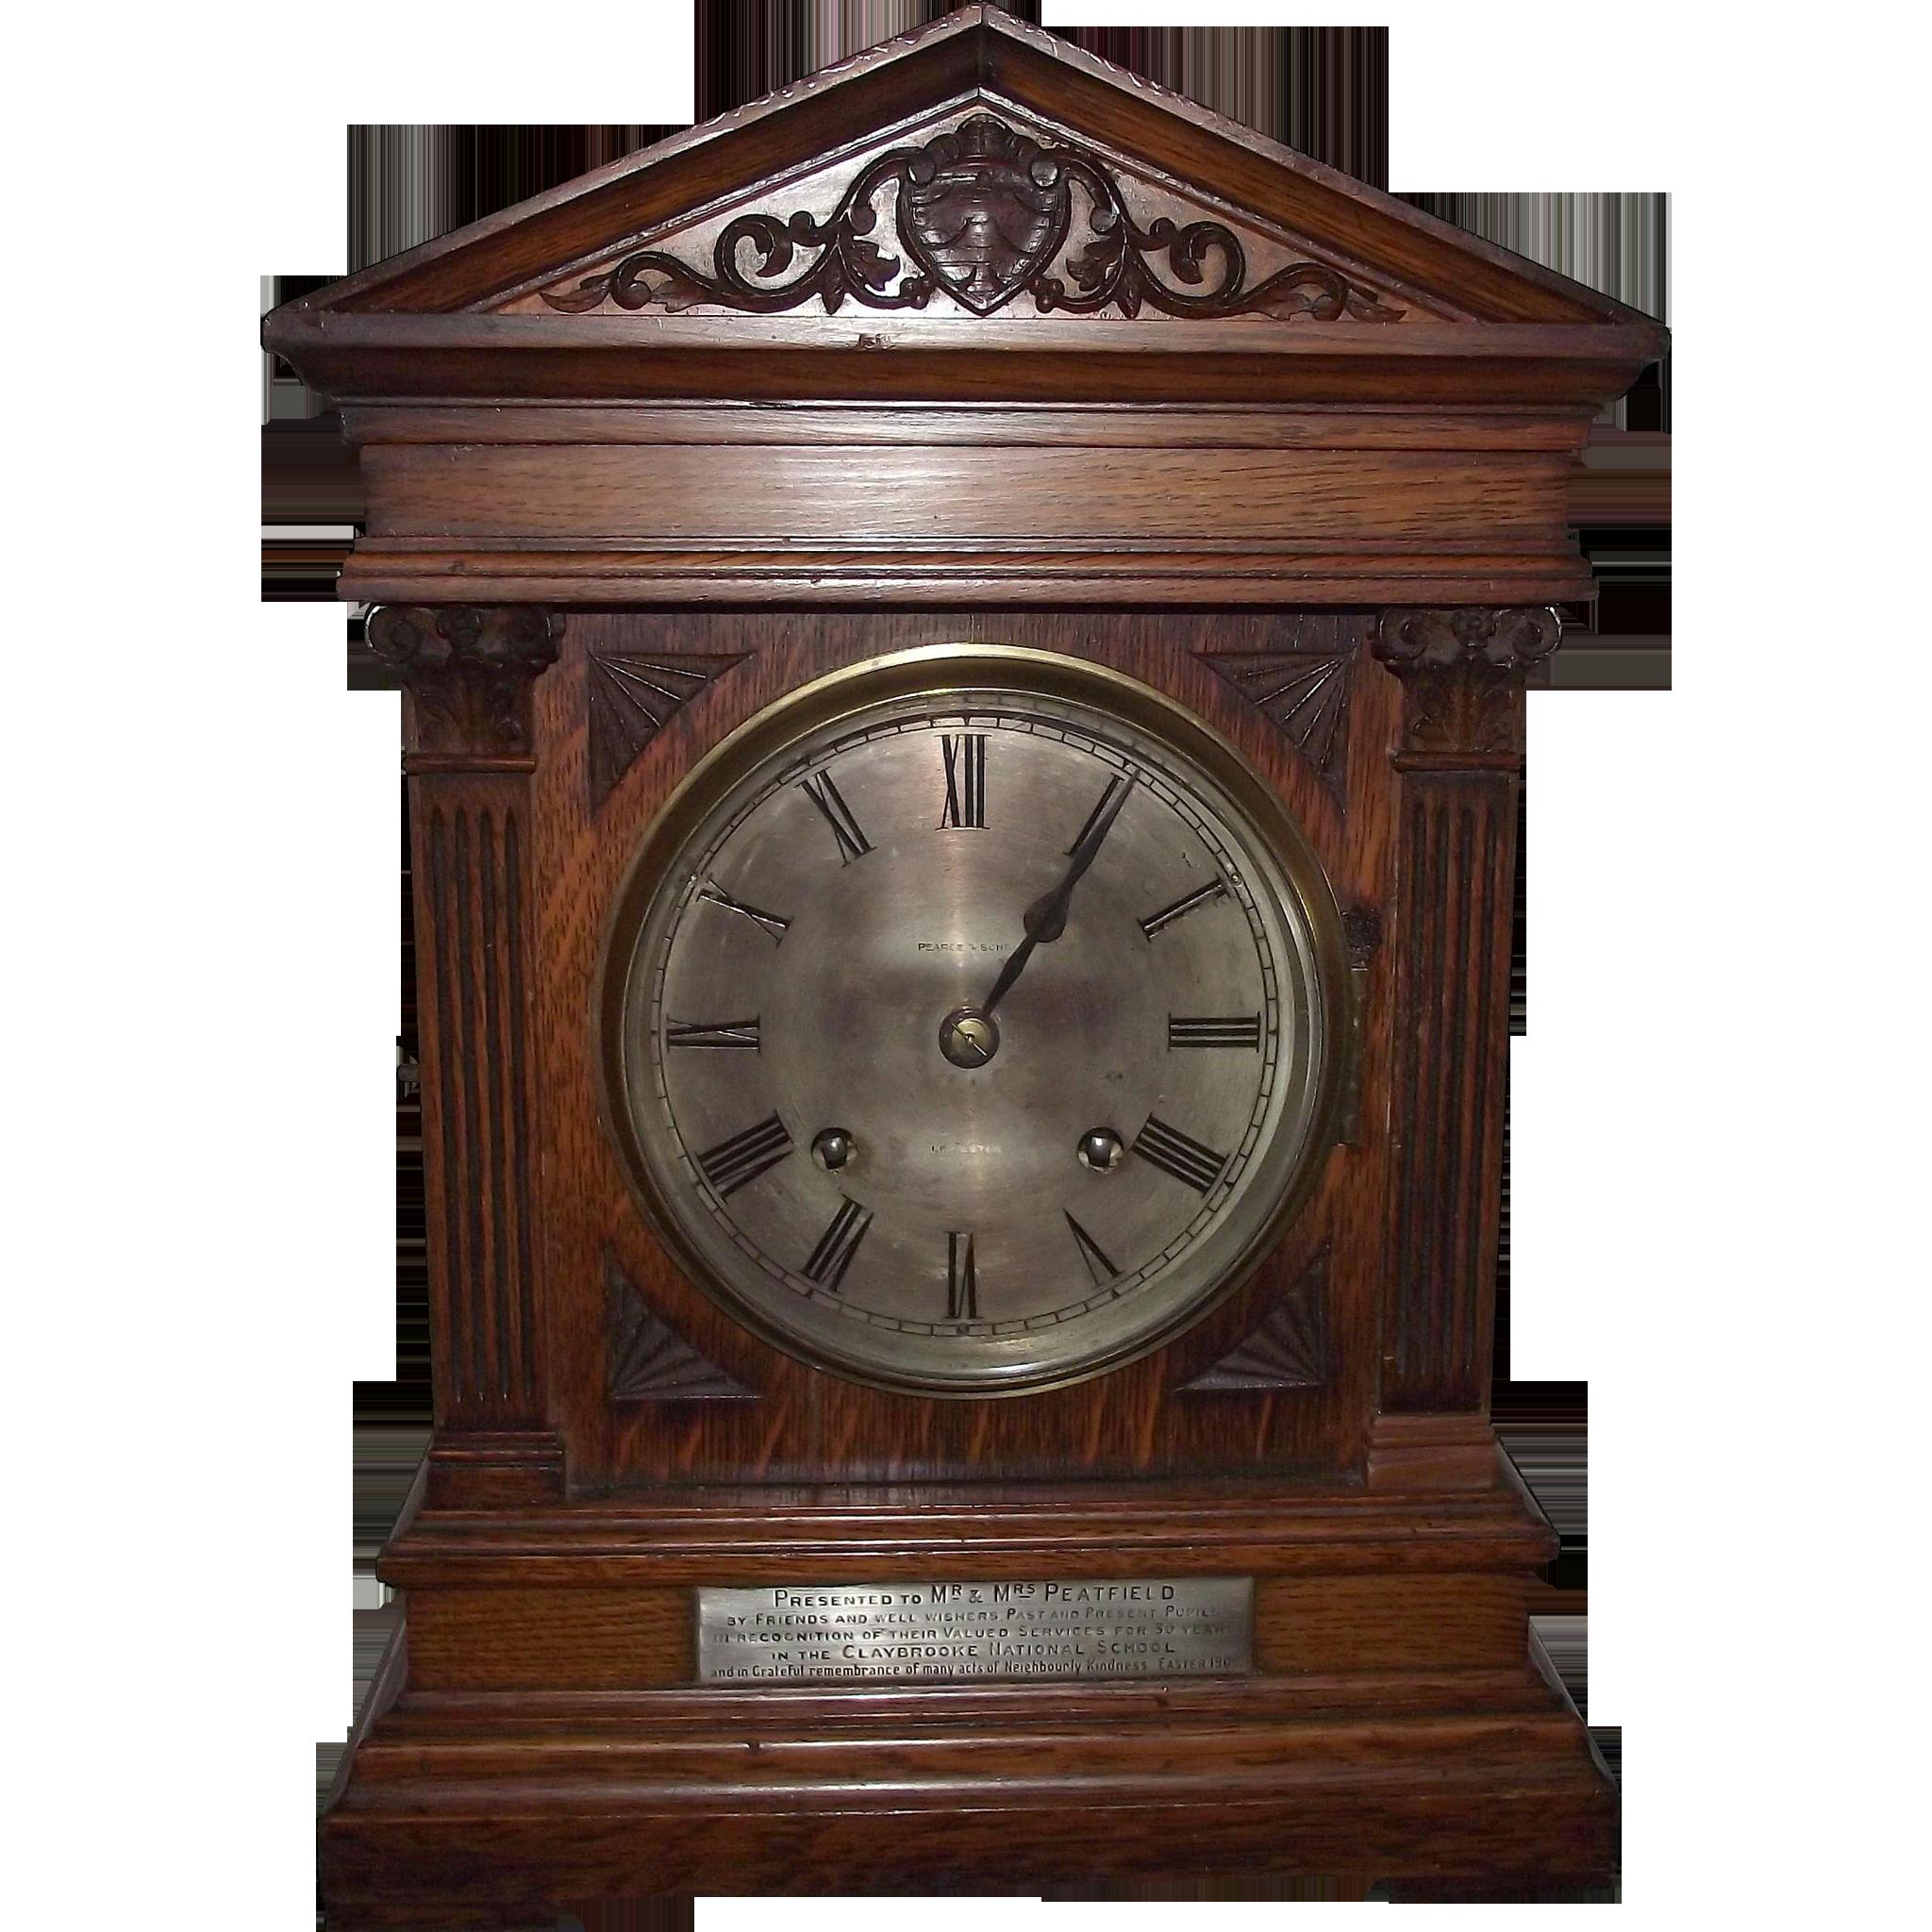 1906 Claybrooke School Presentation Oak Mantle Clock with Winterhalder & Hoffmeier 1/4 Hour Chiming Movement !!!